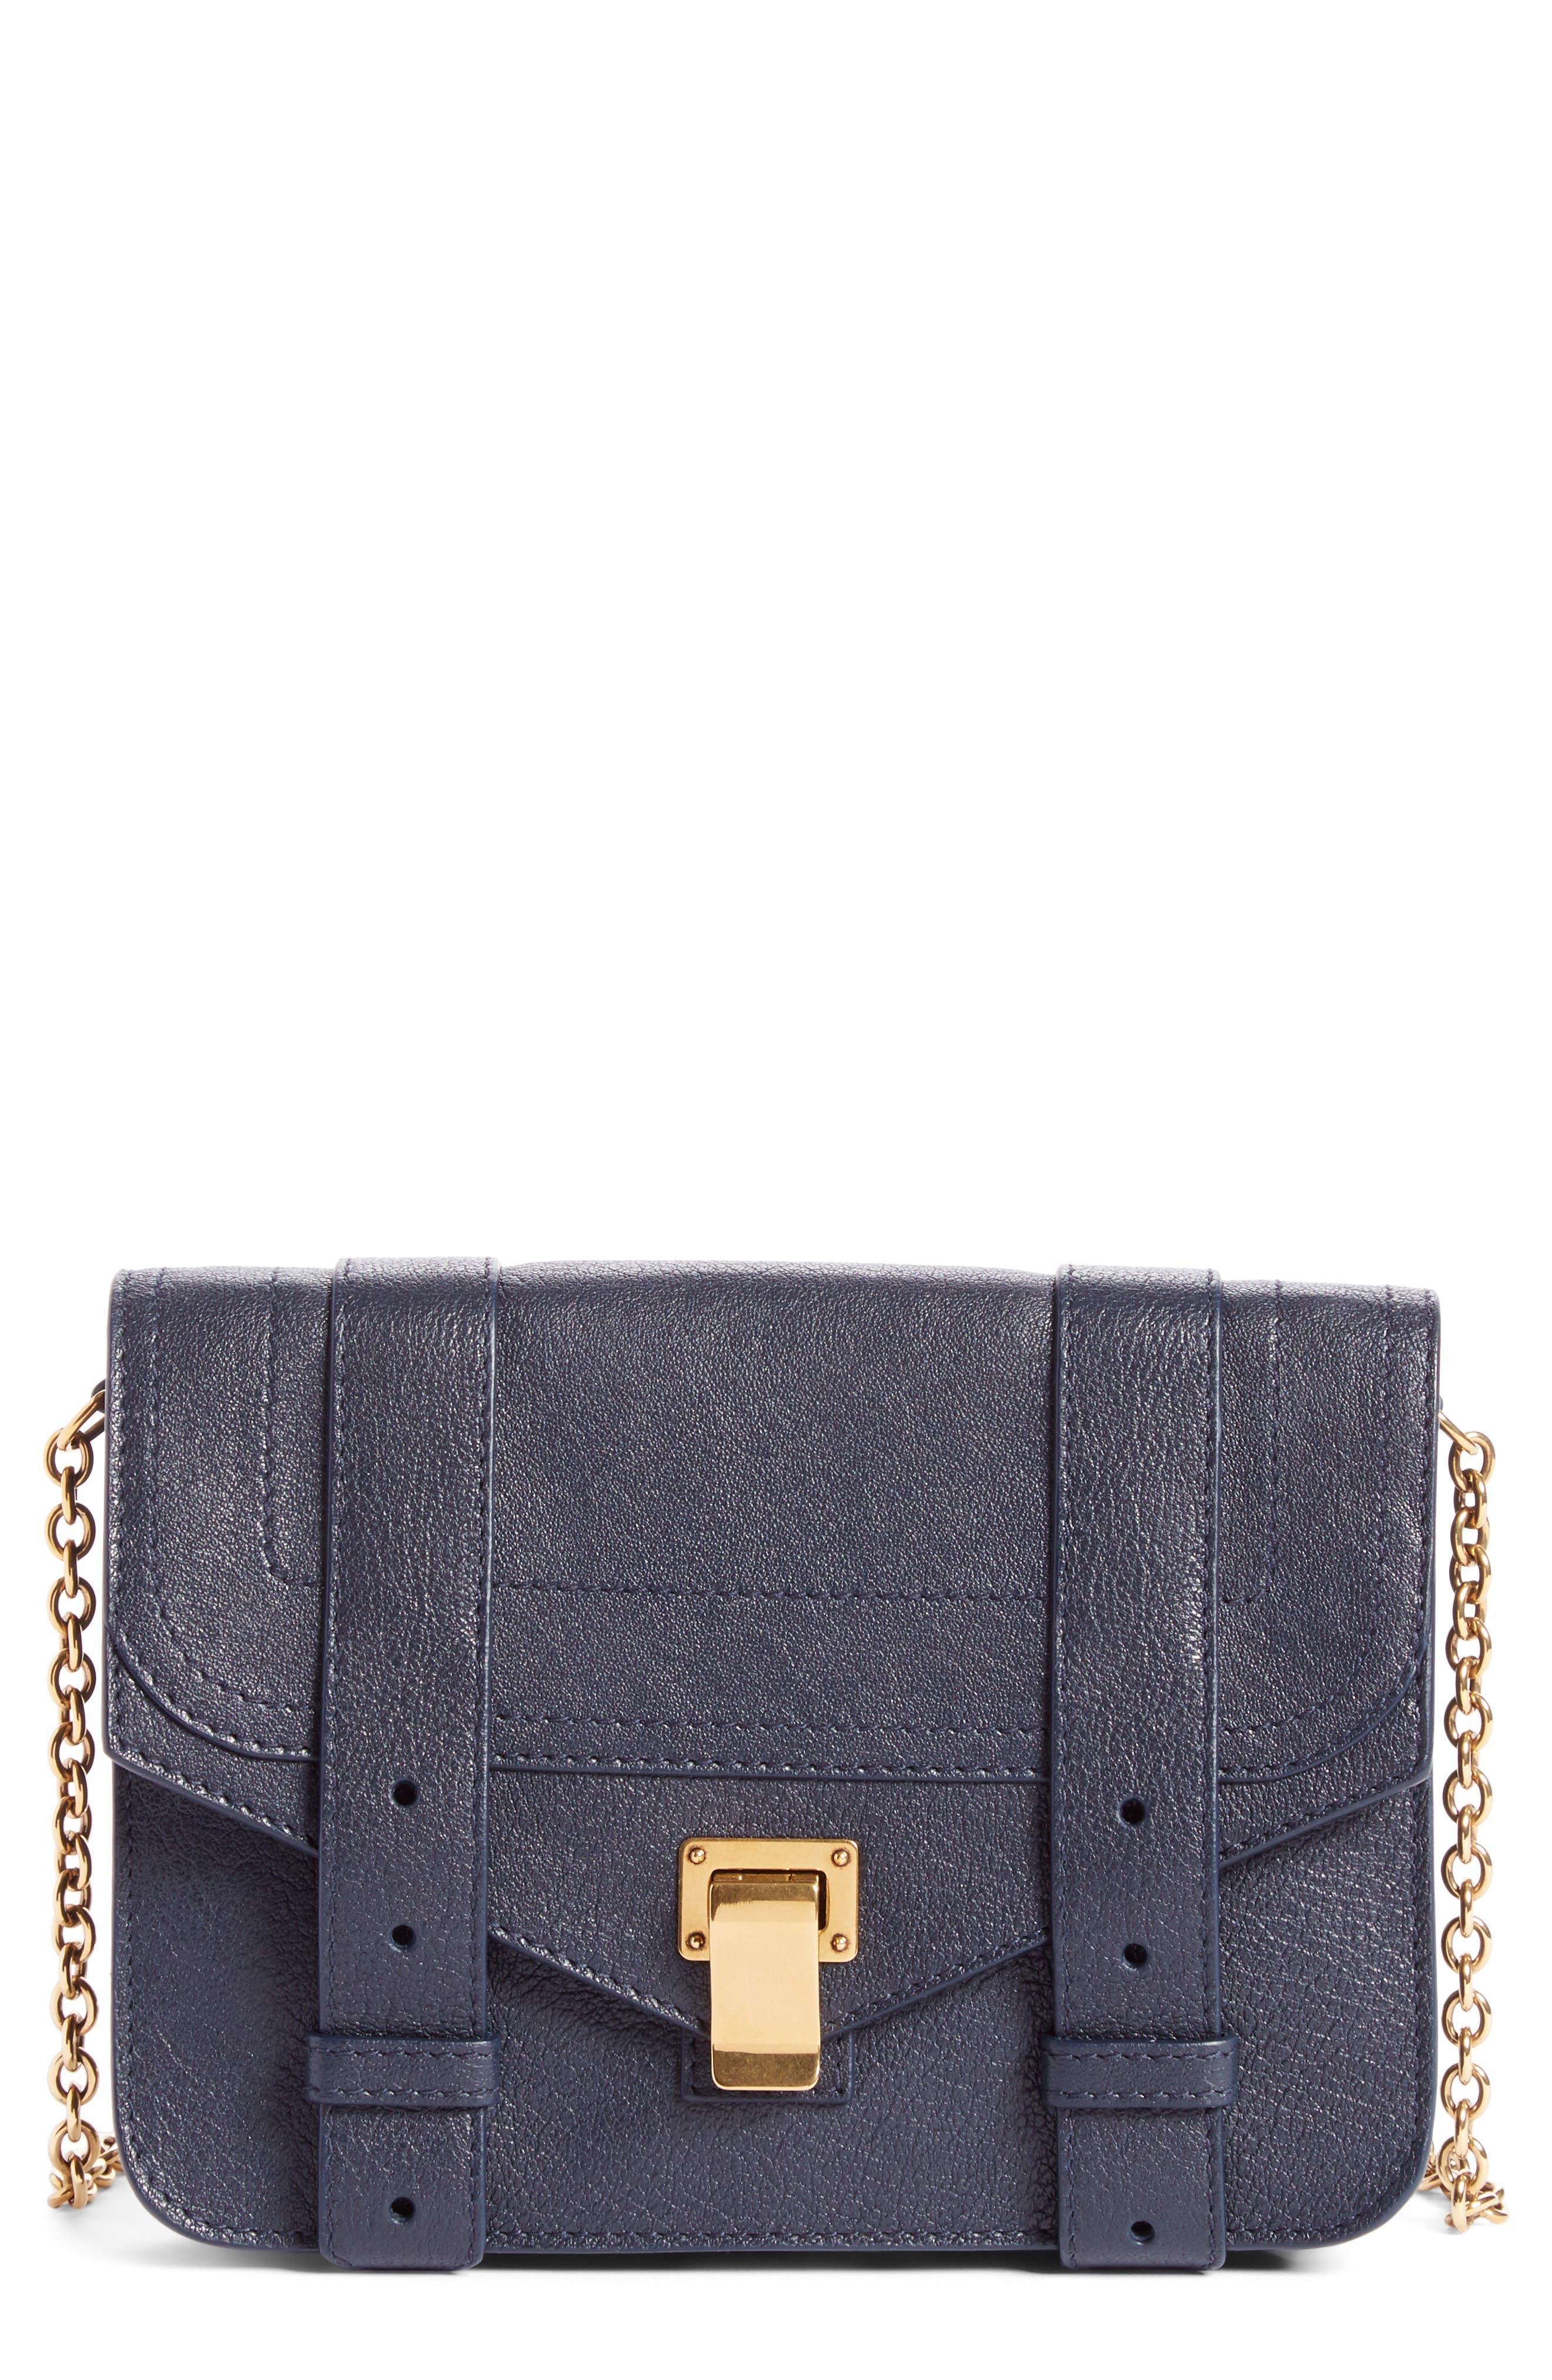 Main Image - Proenza Schouler PS1 Lambskin Leather Chain Wallet